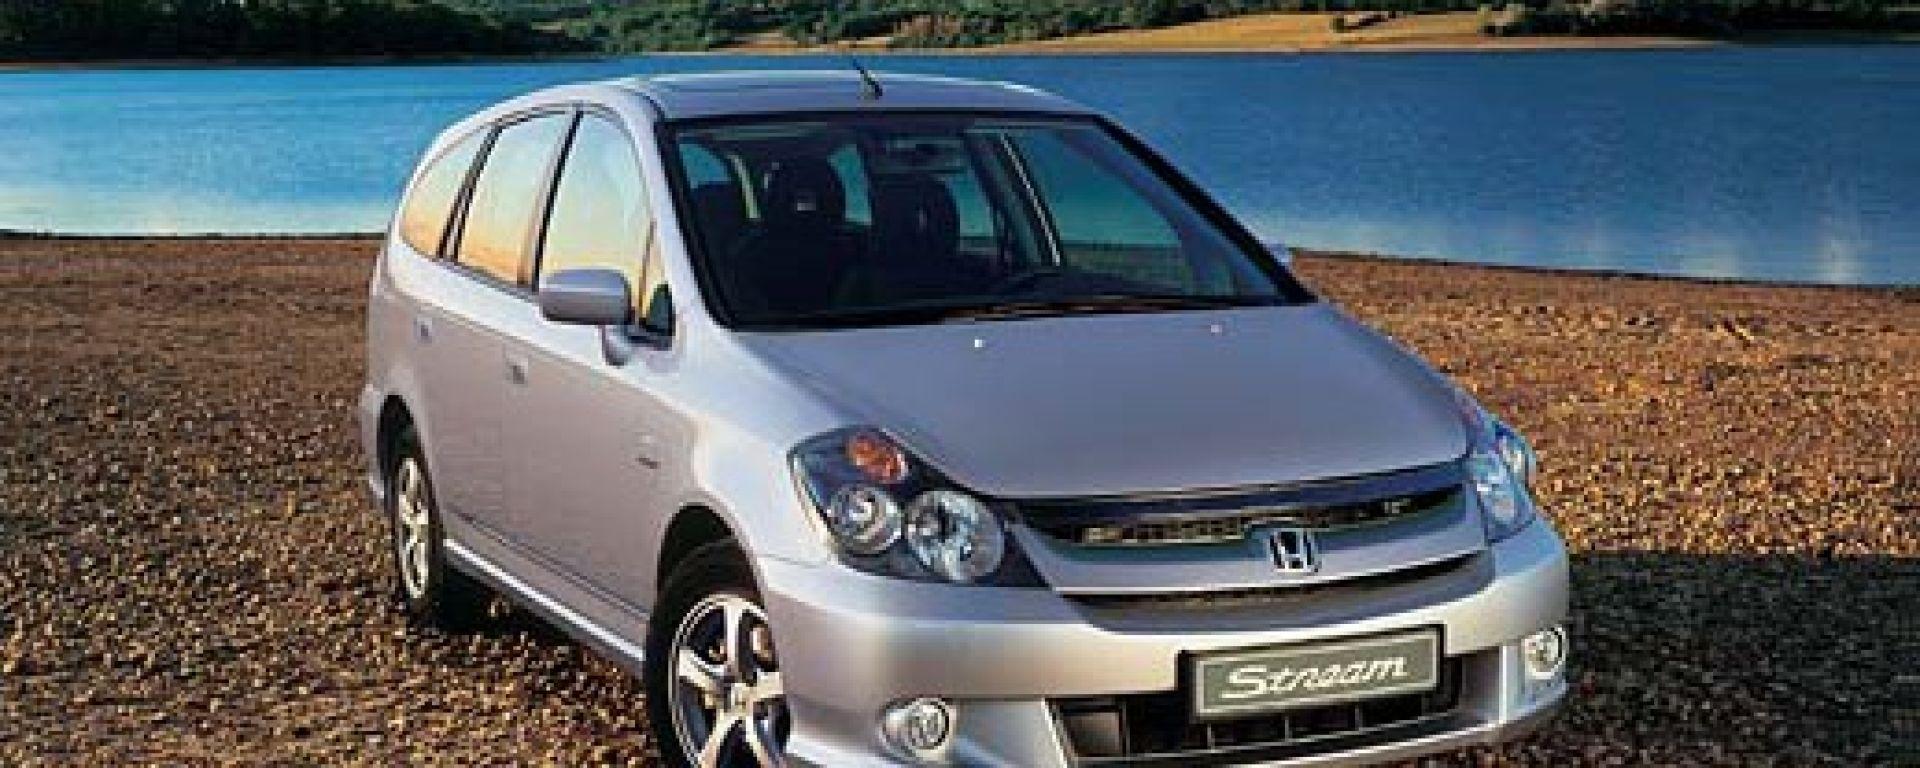 Anteprima: Honda Stream 2004